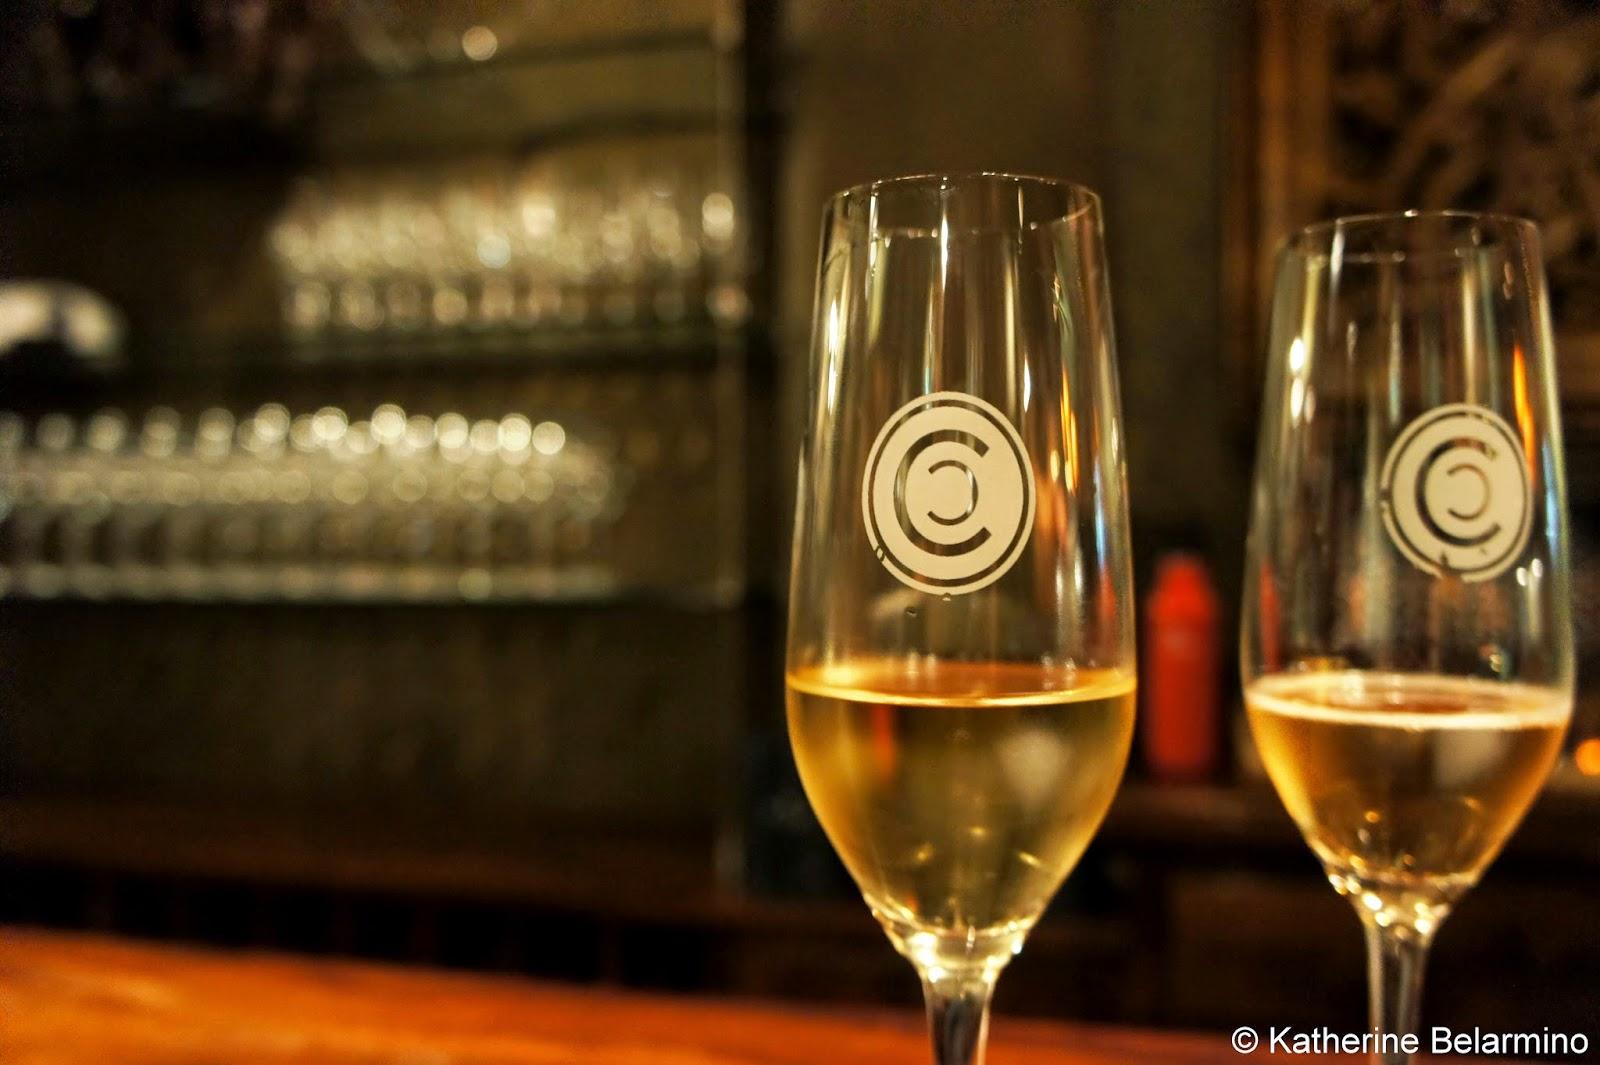 Caraccioli Cellars Sparkling Wine Carmel-by-the-Sea California